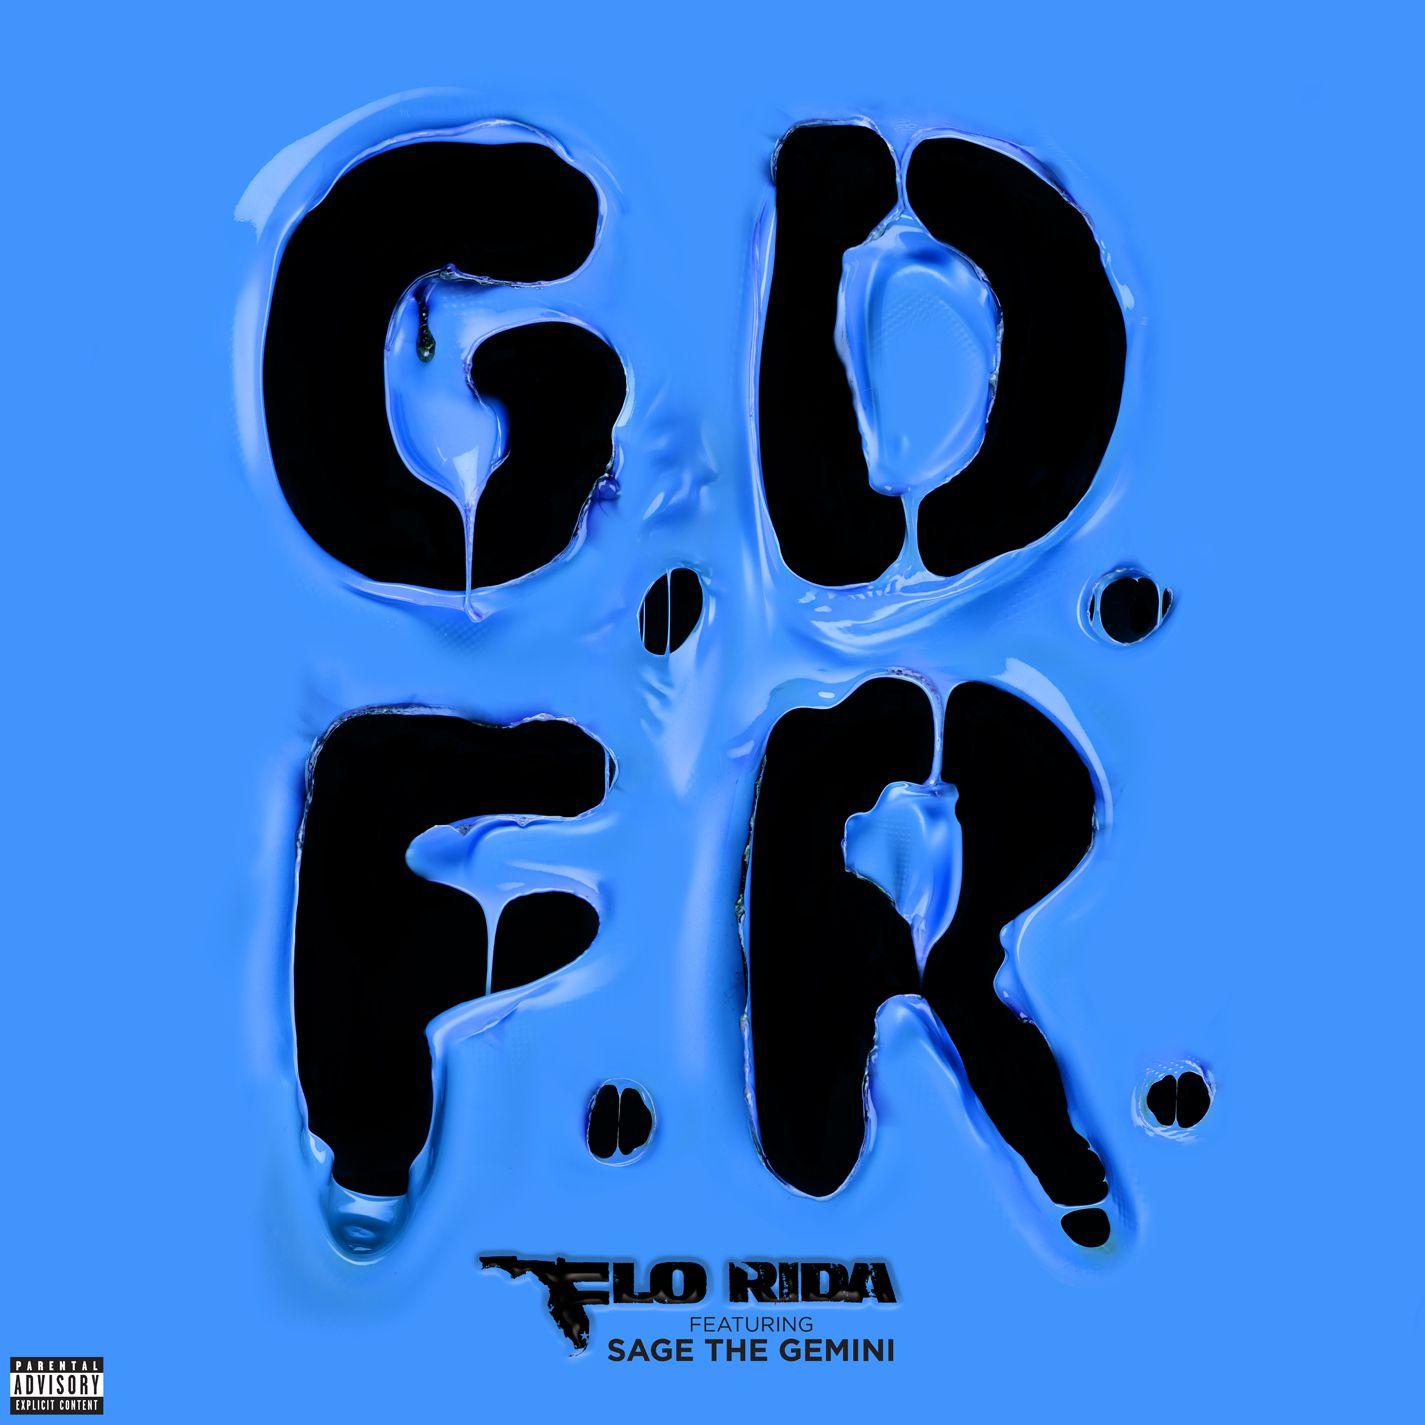 Flo Rida - G.D.F.R. featuring Sage the Gemini